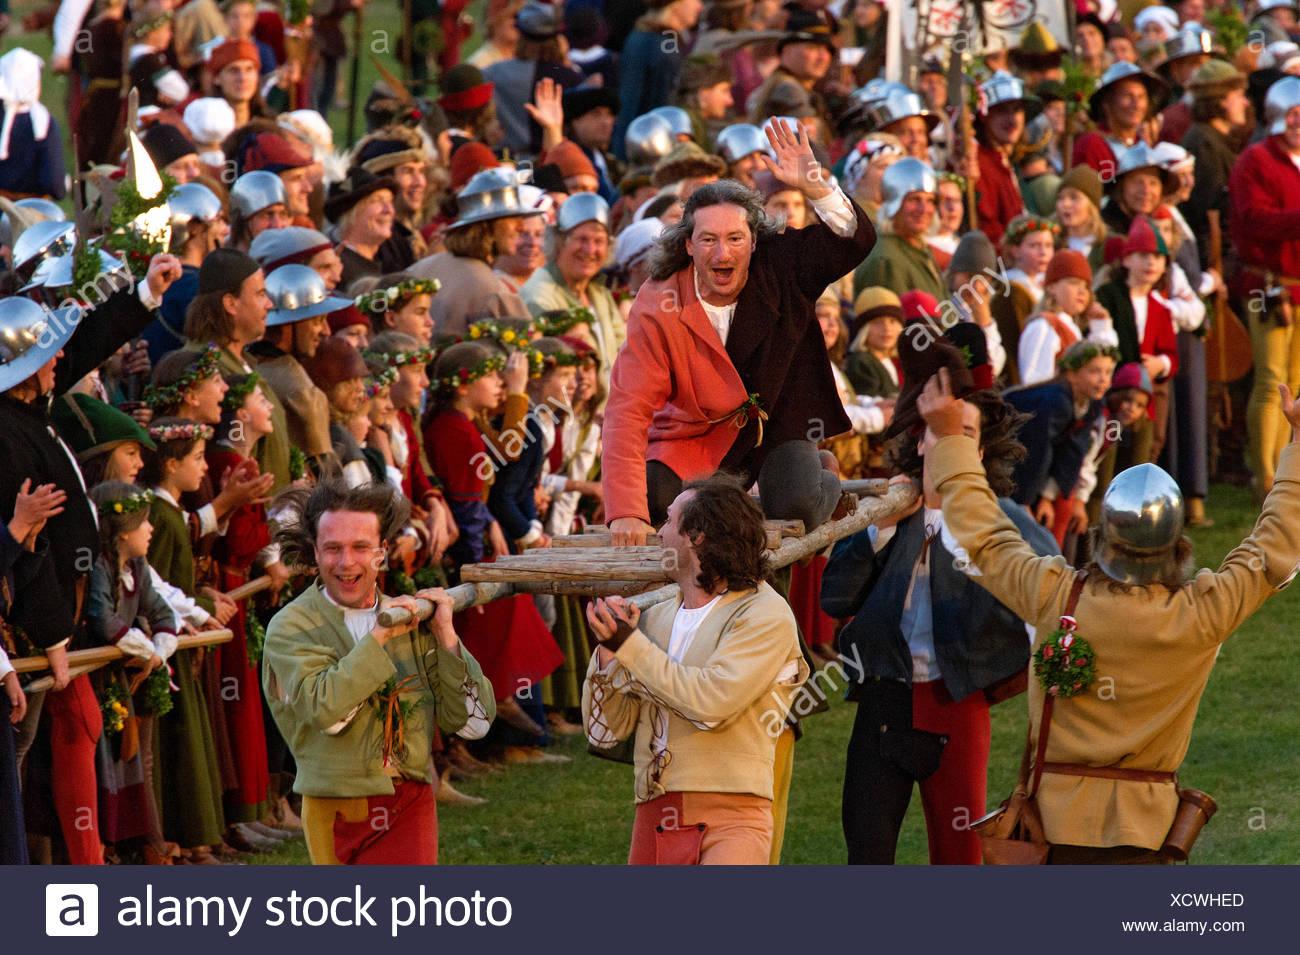 Festive games on the show grounds, ladder races wearing medieval costumes, 'Landshut Wedding', Landshut, Lower Bavaria, Bavaria - Stock Image